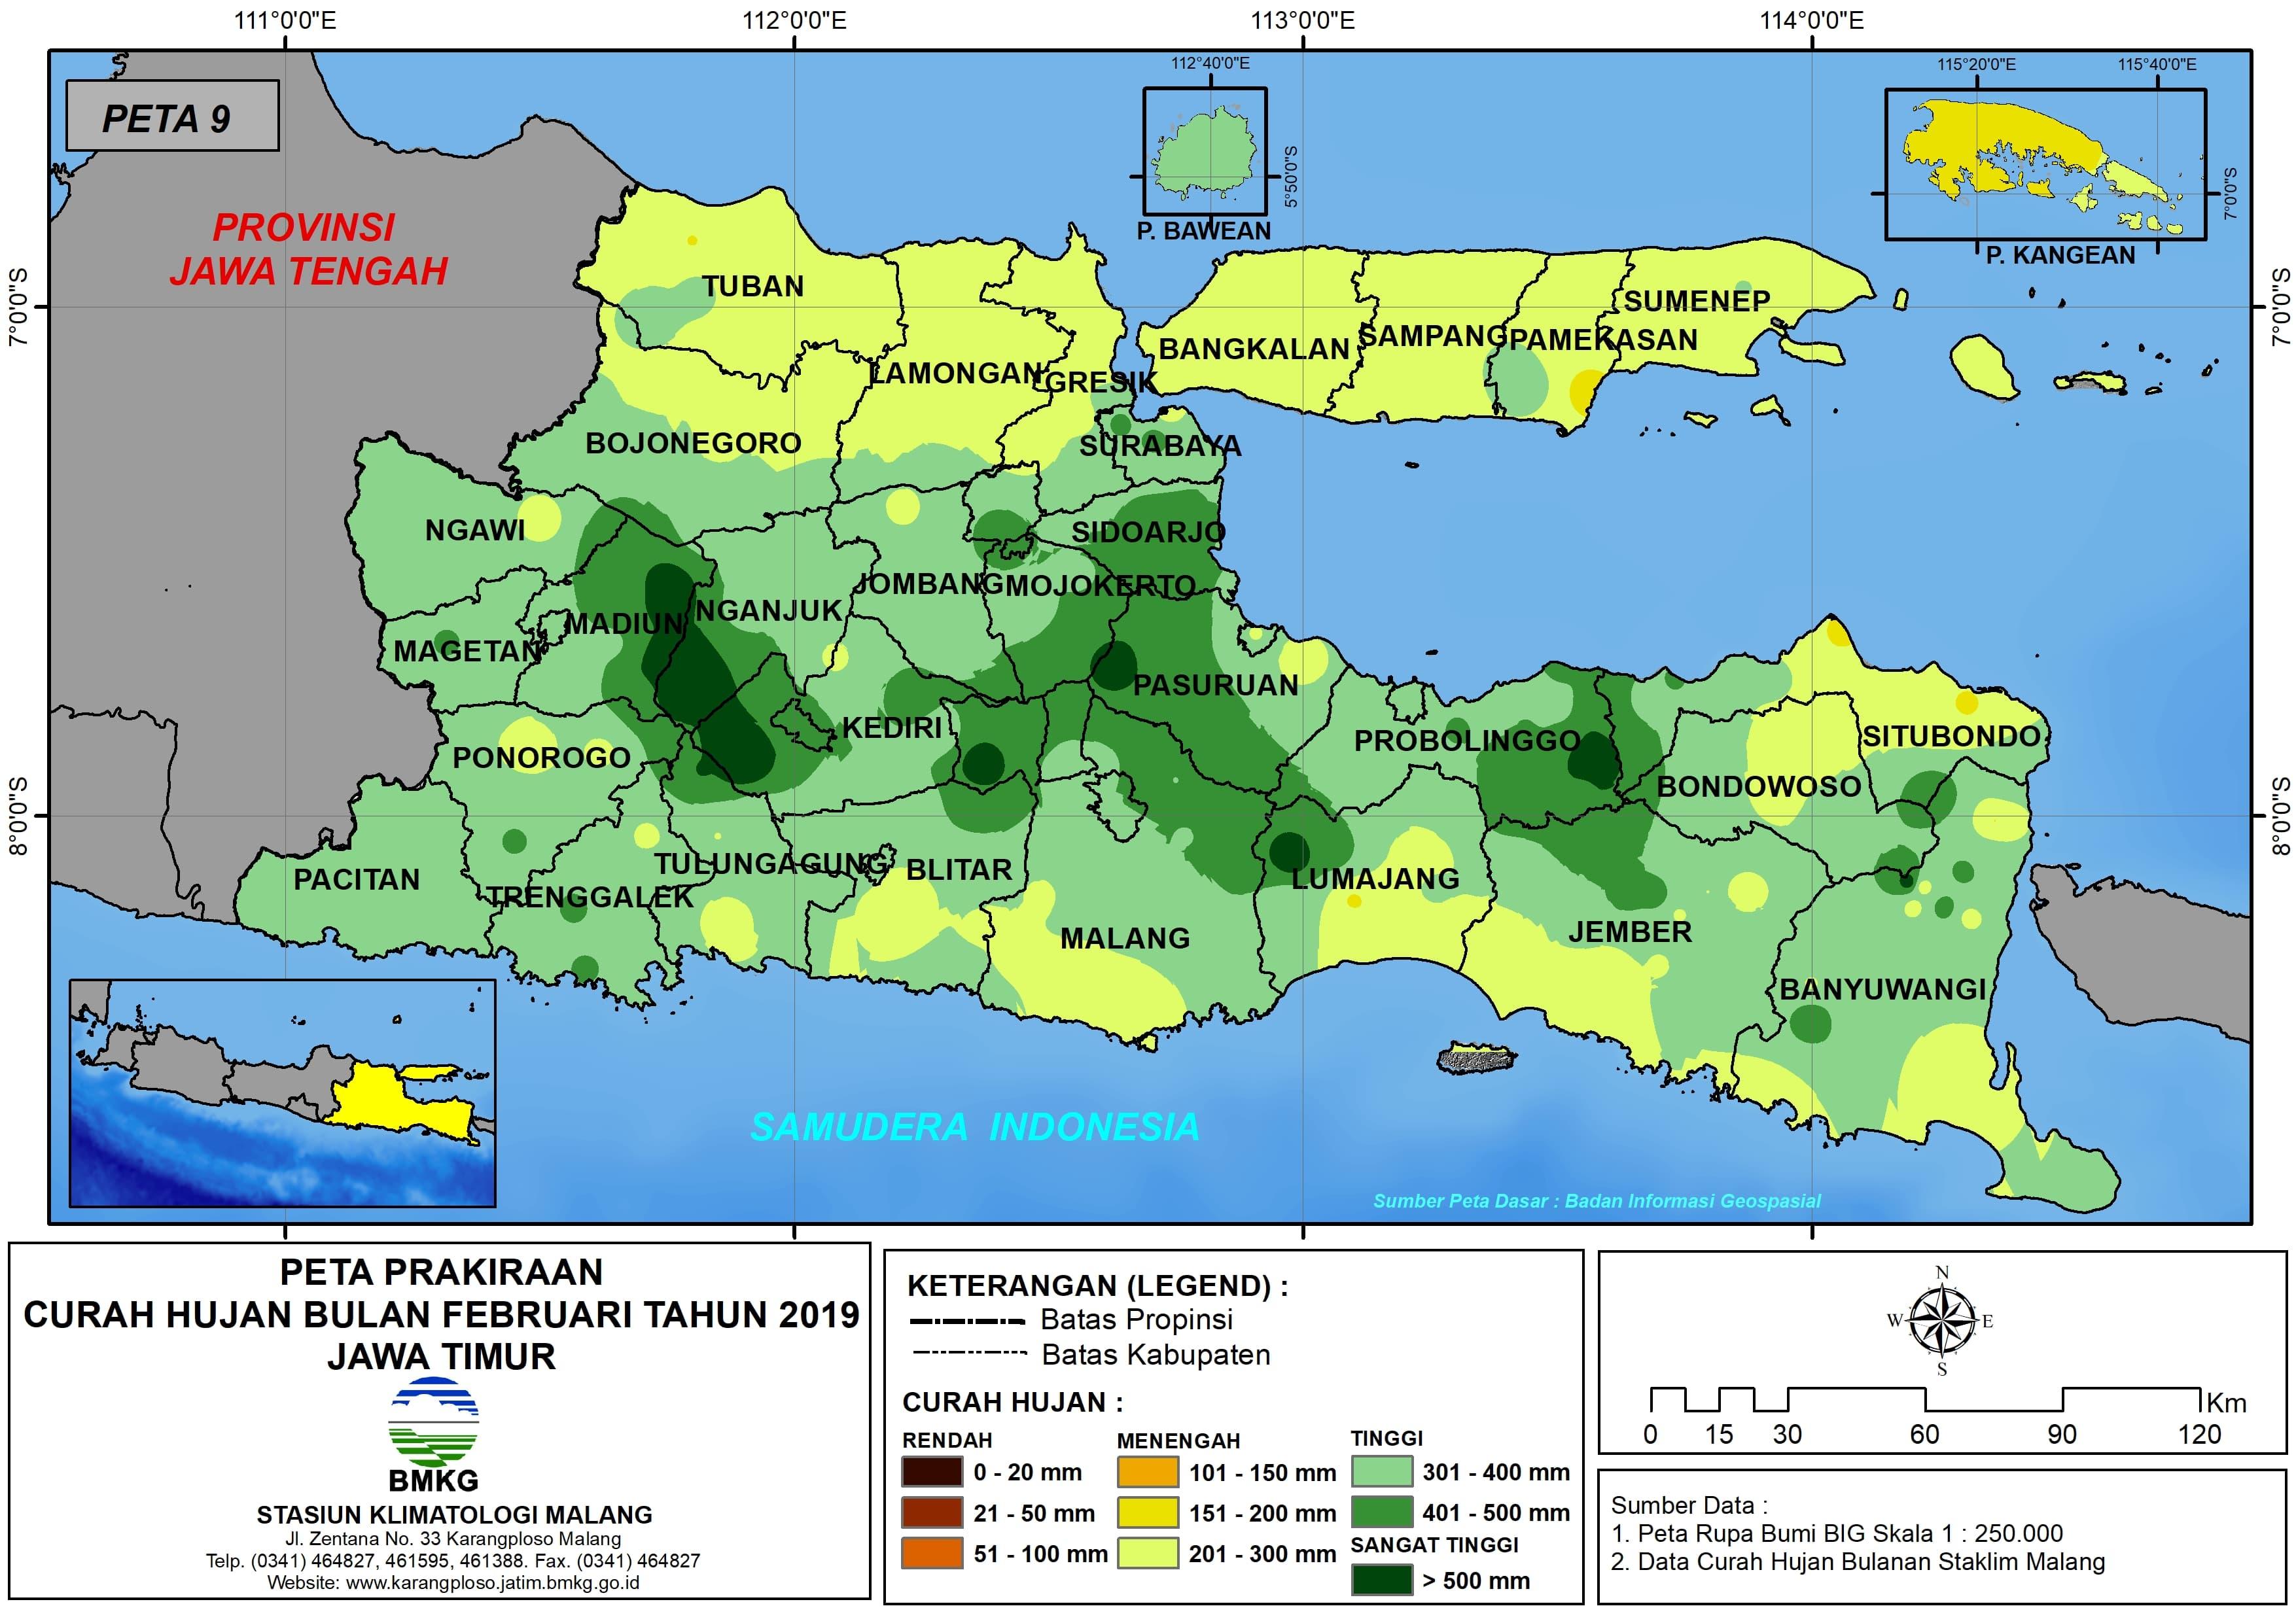 Prakiraan Curah Hujan Bulan Februari Tahun 2019 di Provinsi Jawa Timur Update dari Analisis Bulan Oktober 2018